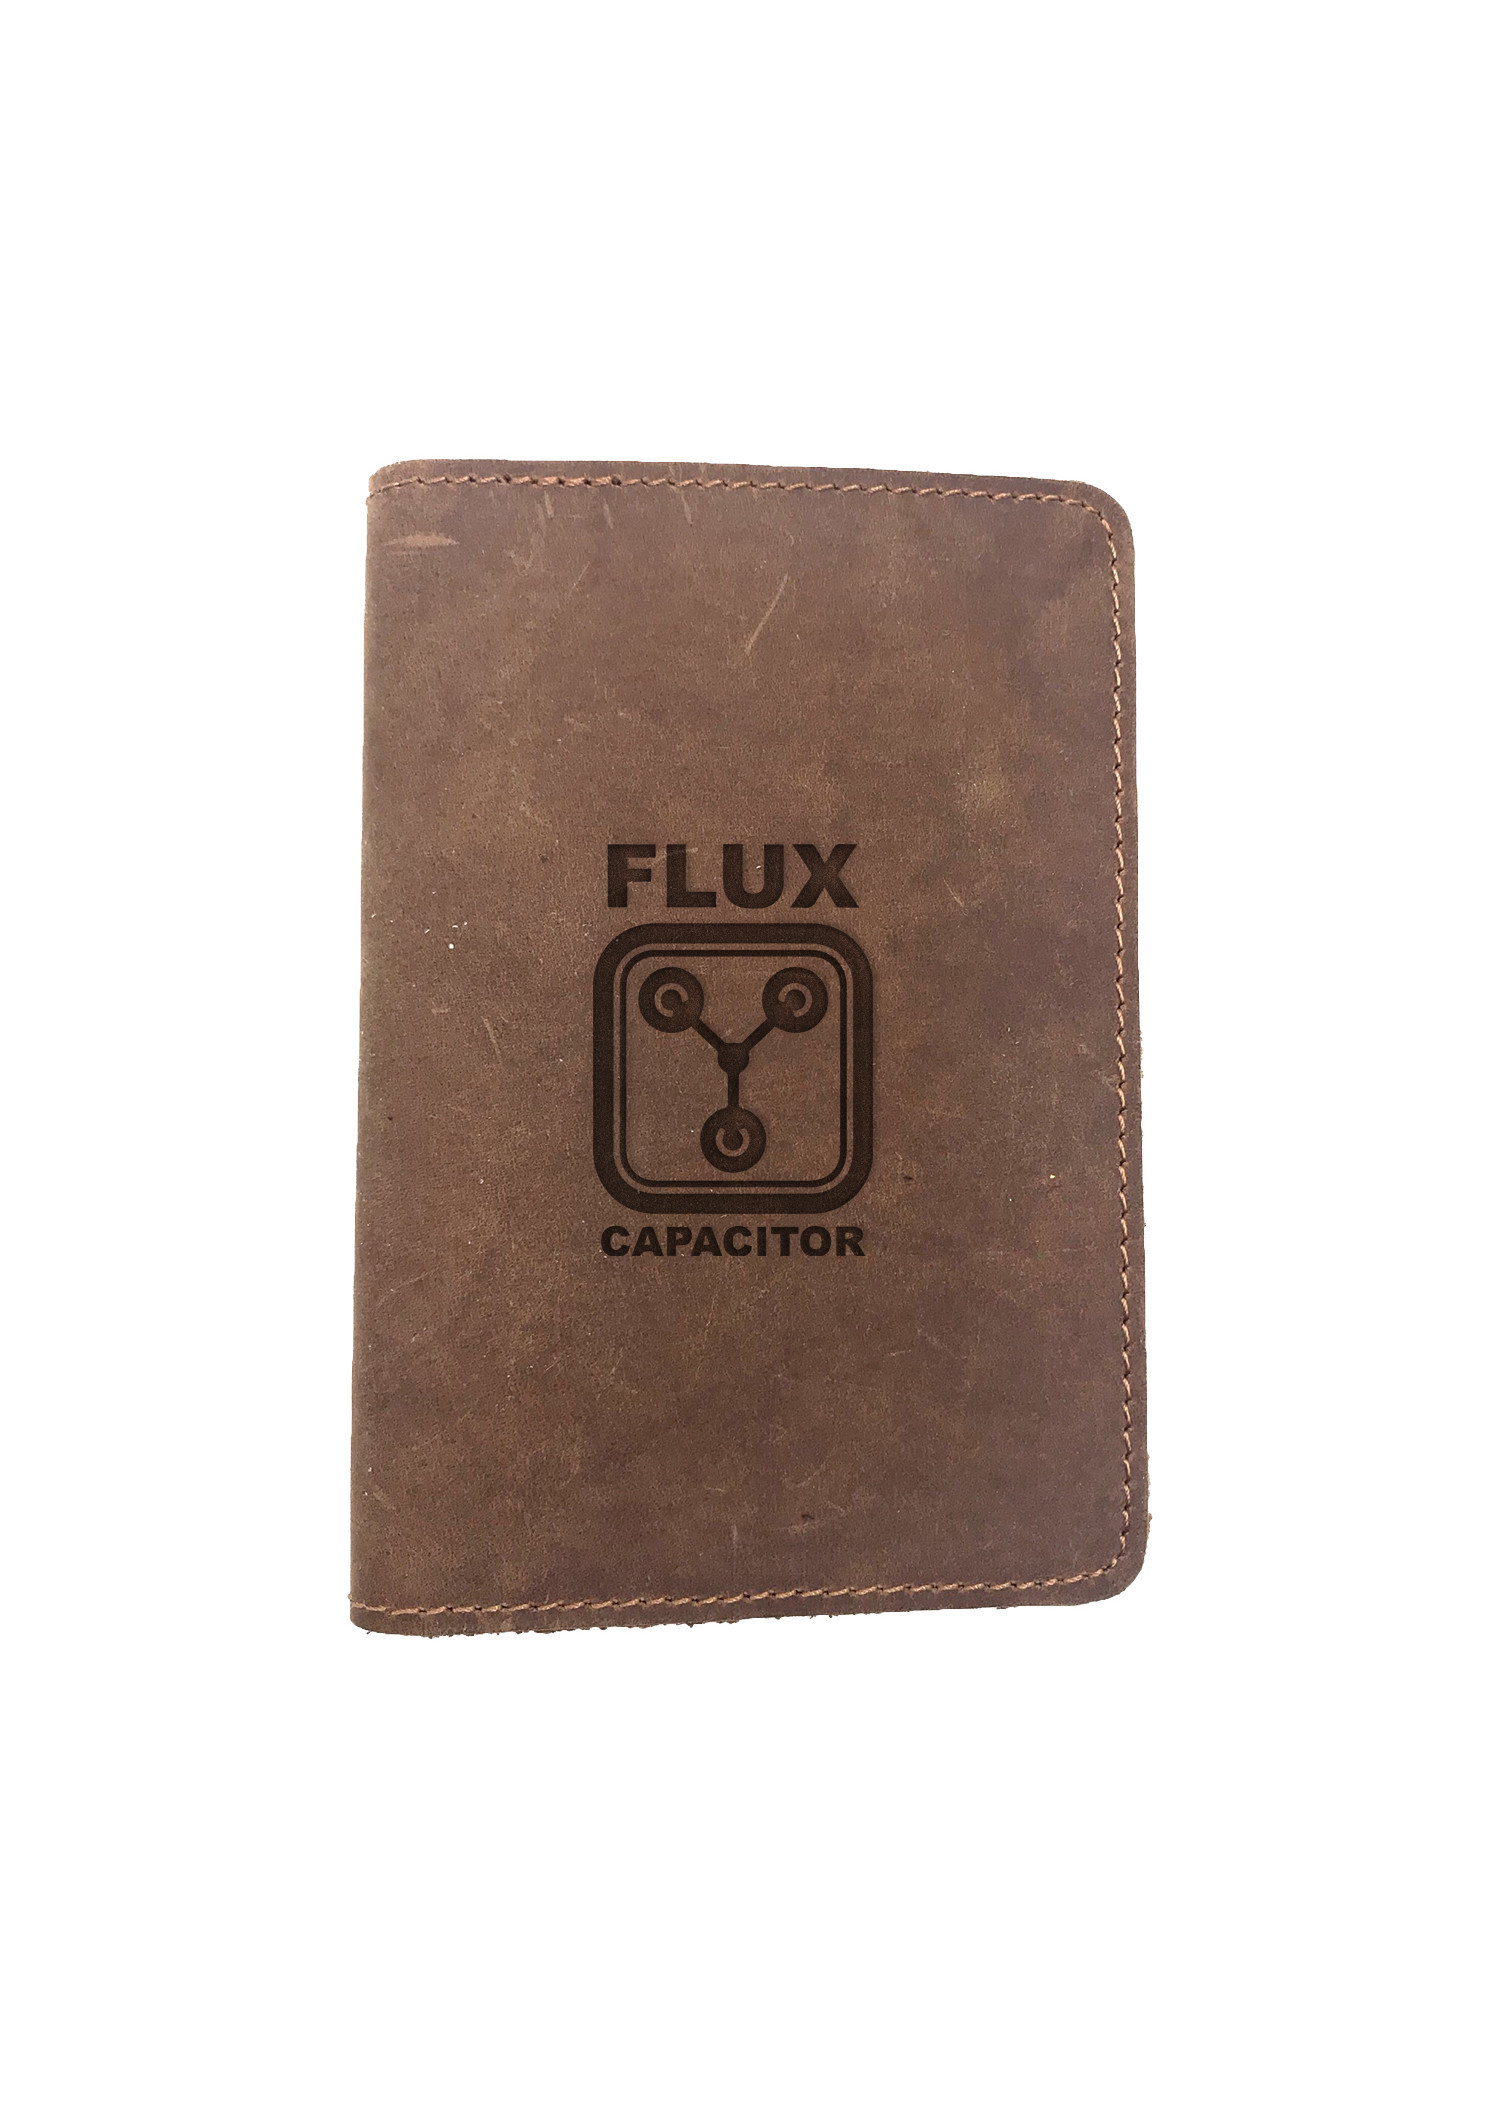 Passport Cover Bao Da Hộ Chiếu Da Sáp Khắc Hình Hình FULX CAPACITOR (BROWN)